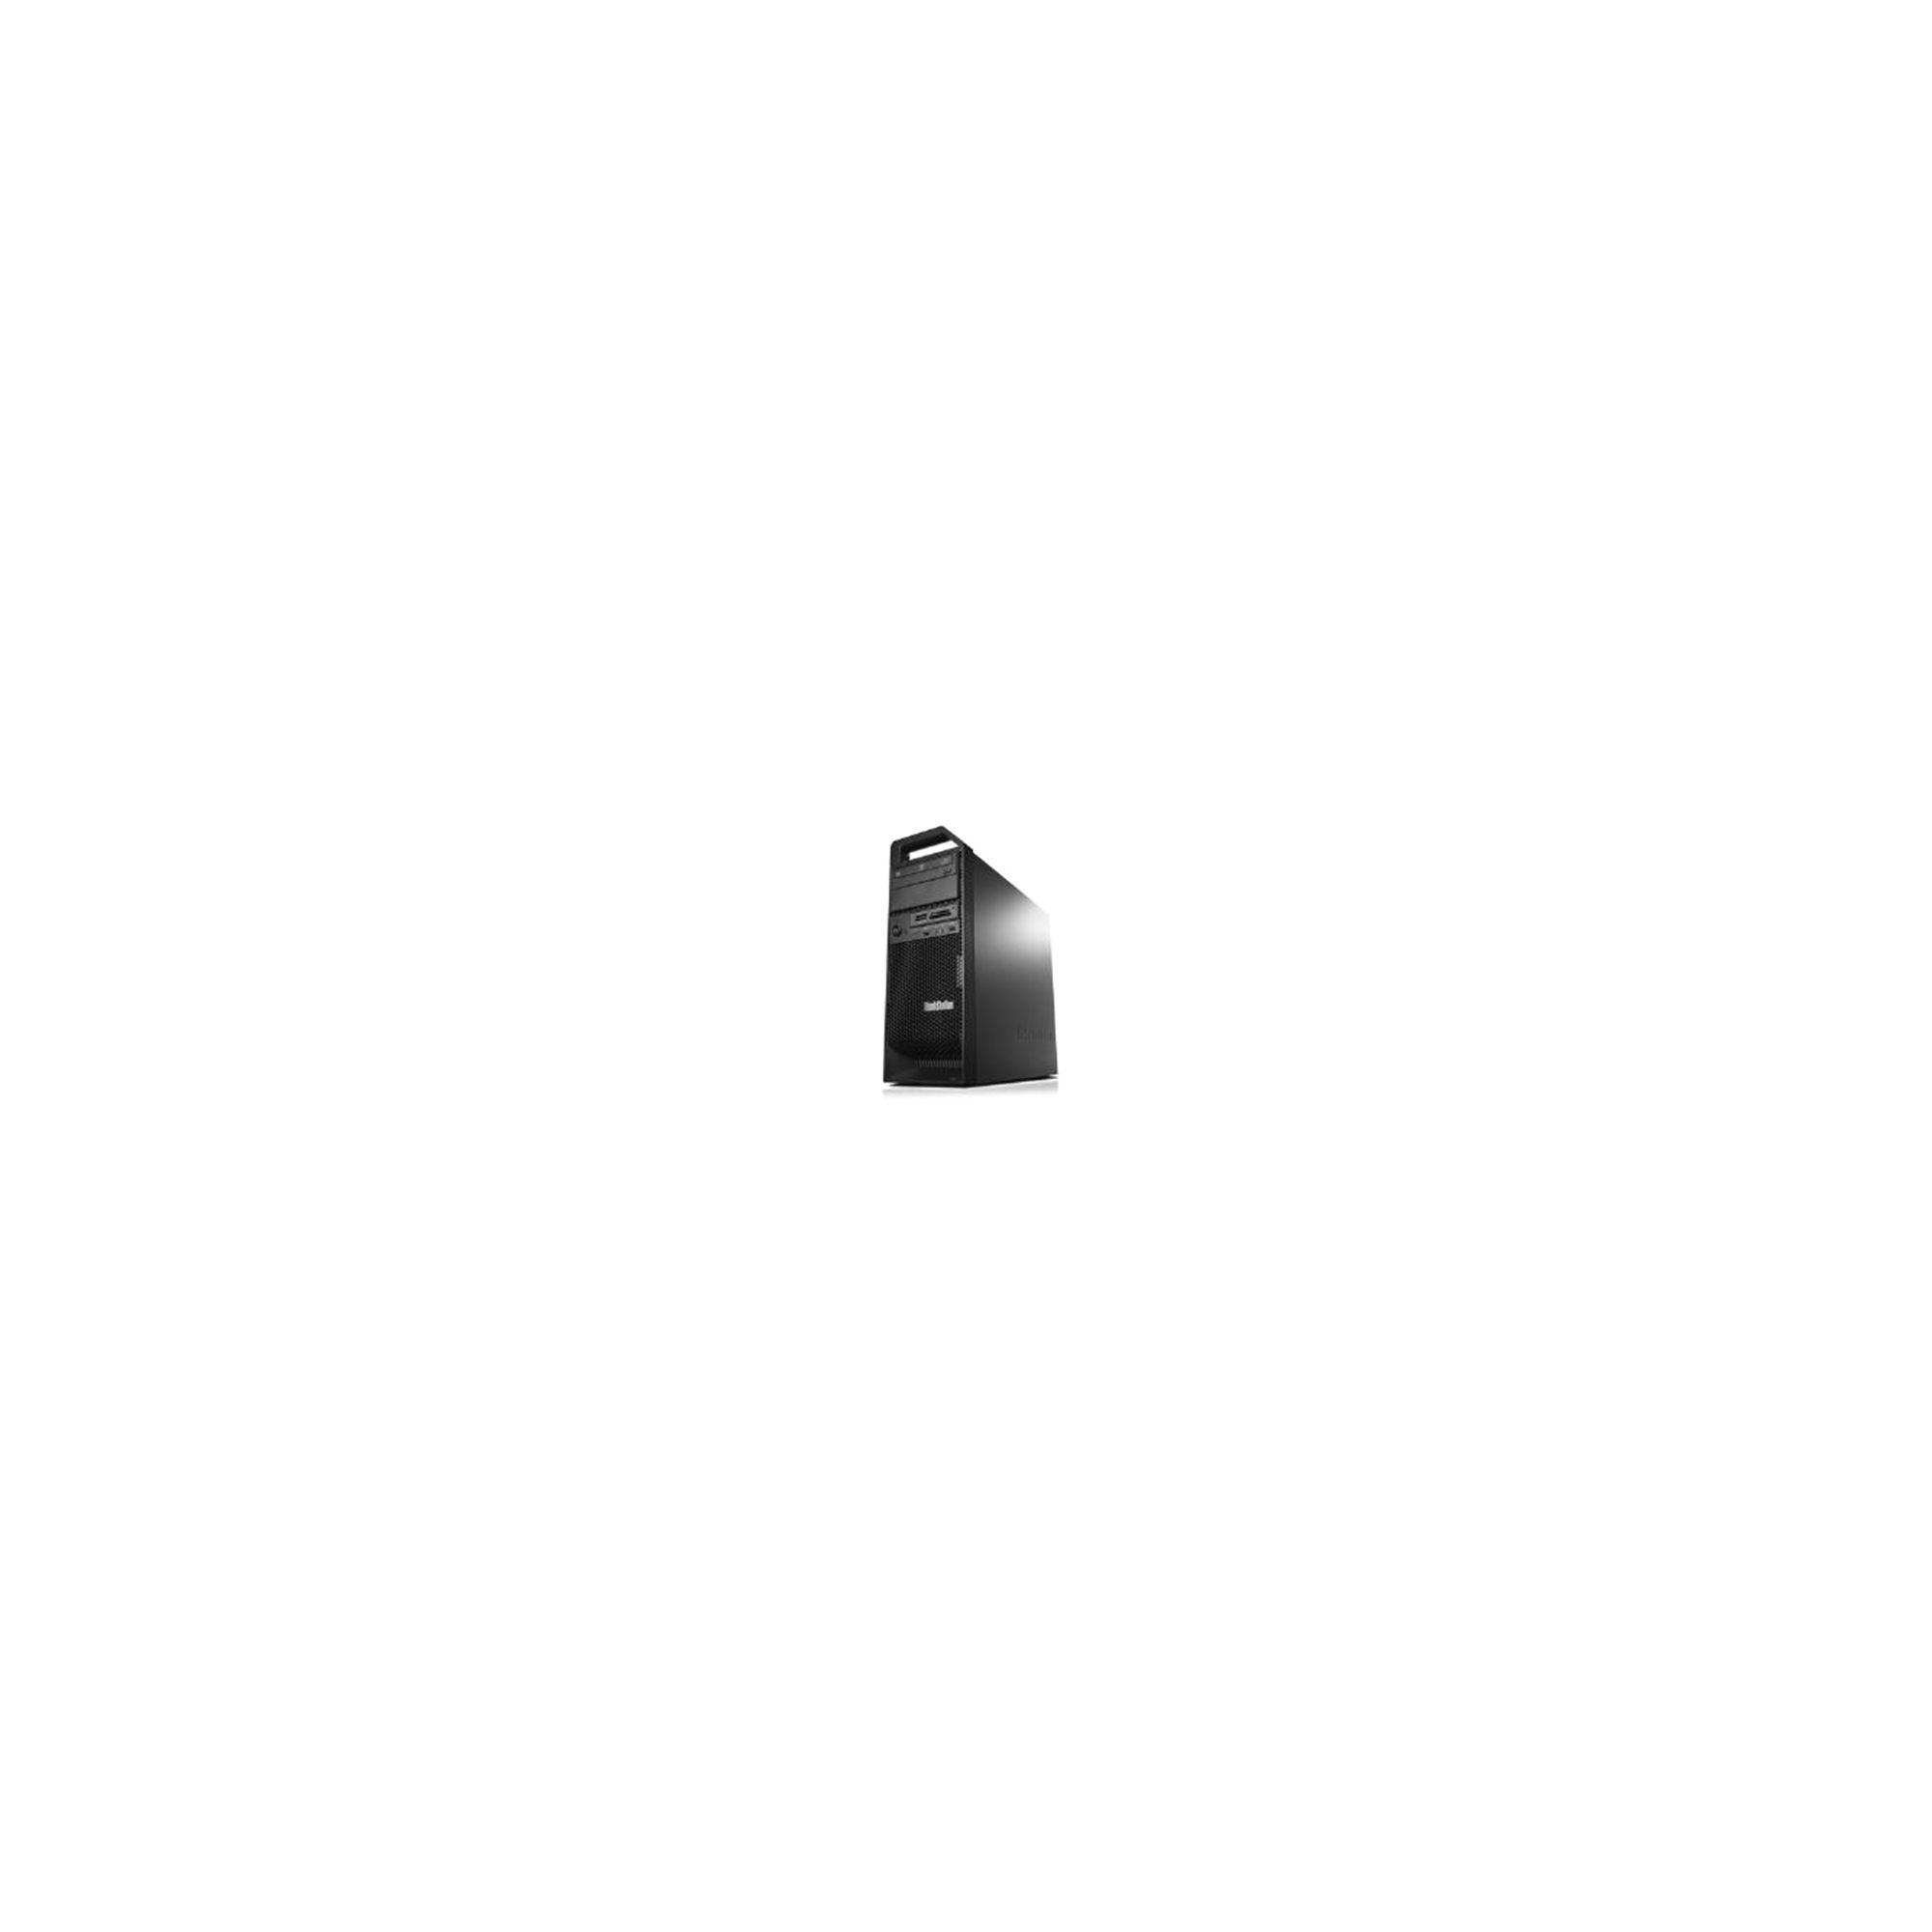 Lenovo ThinkStation S30 056855G Tower Workstation Xeon E5 (1603) 2.8GHz 4GB (1x4GB) 500GB DVD?RW LAN Windows 7 Pro 64-bit (Black)